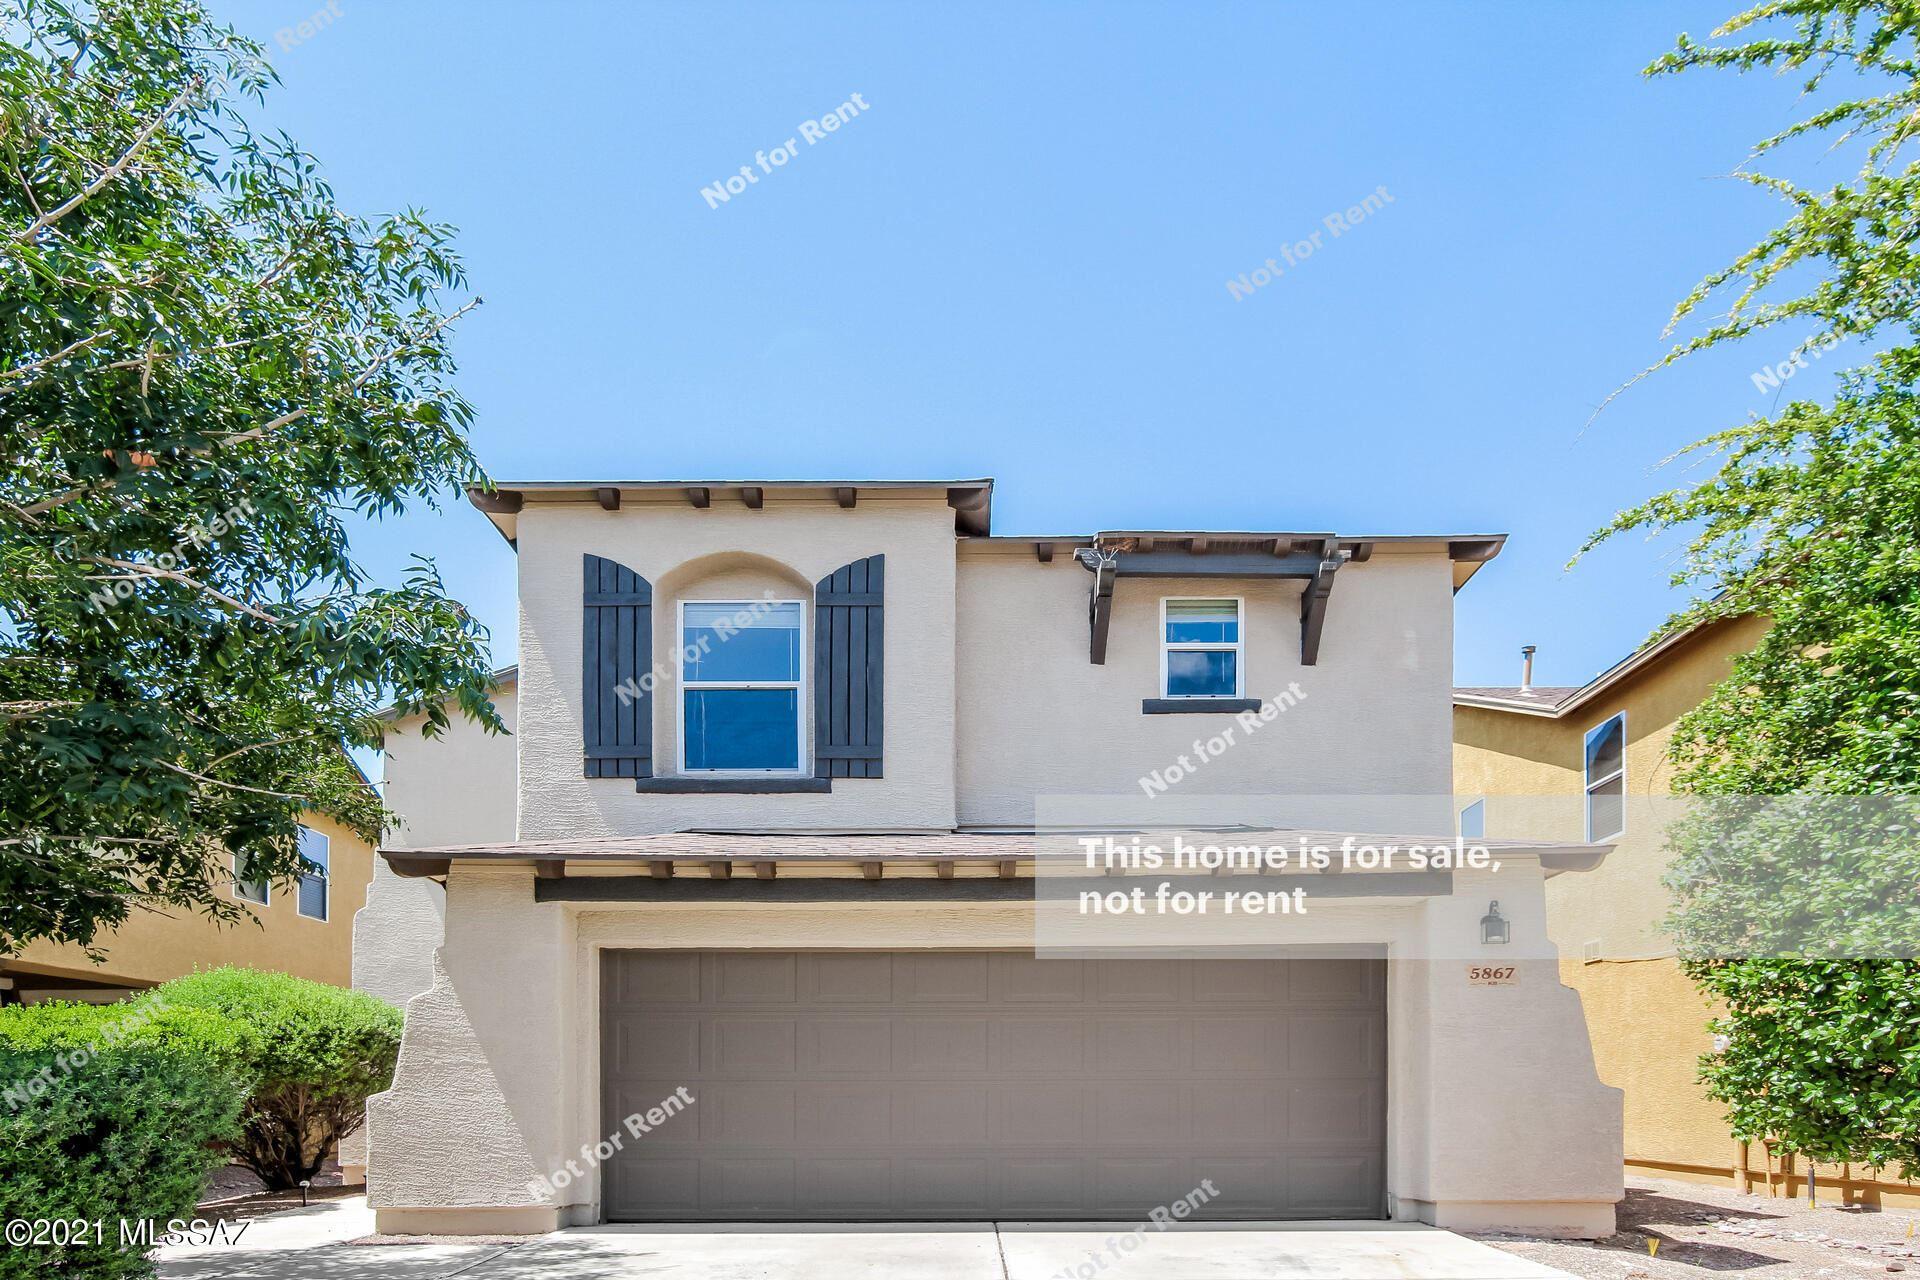 5867 N Orangetip Drive, Tucson, AZ 85741 - MLS#: 22121653